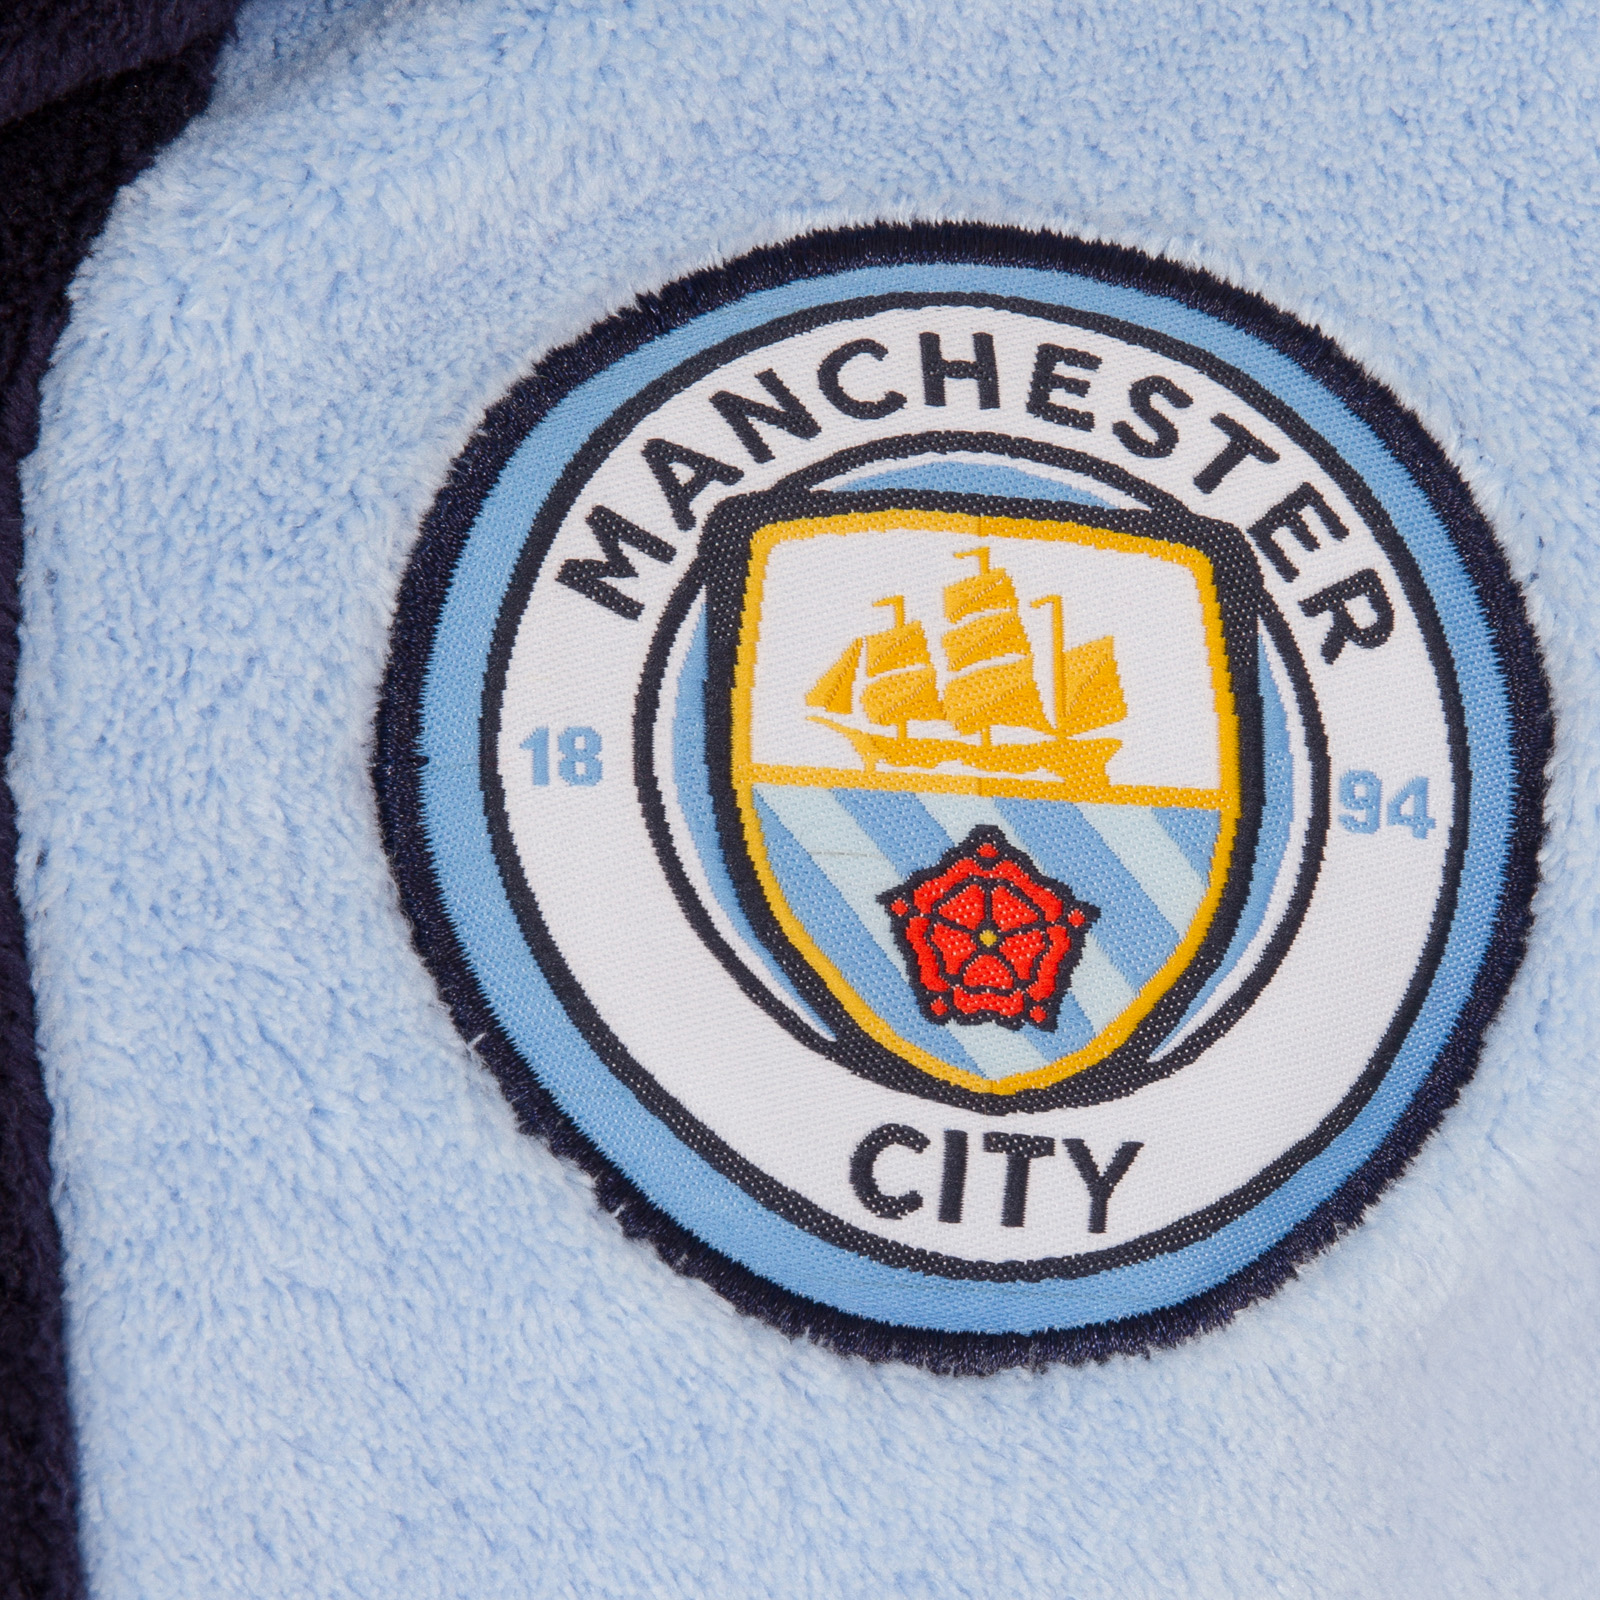 Manchester-City-FC-officiel-Robe-de-chambre-a-capuche-polaire-garcon